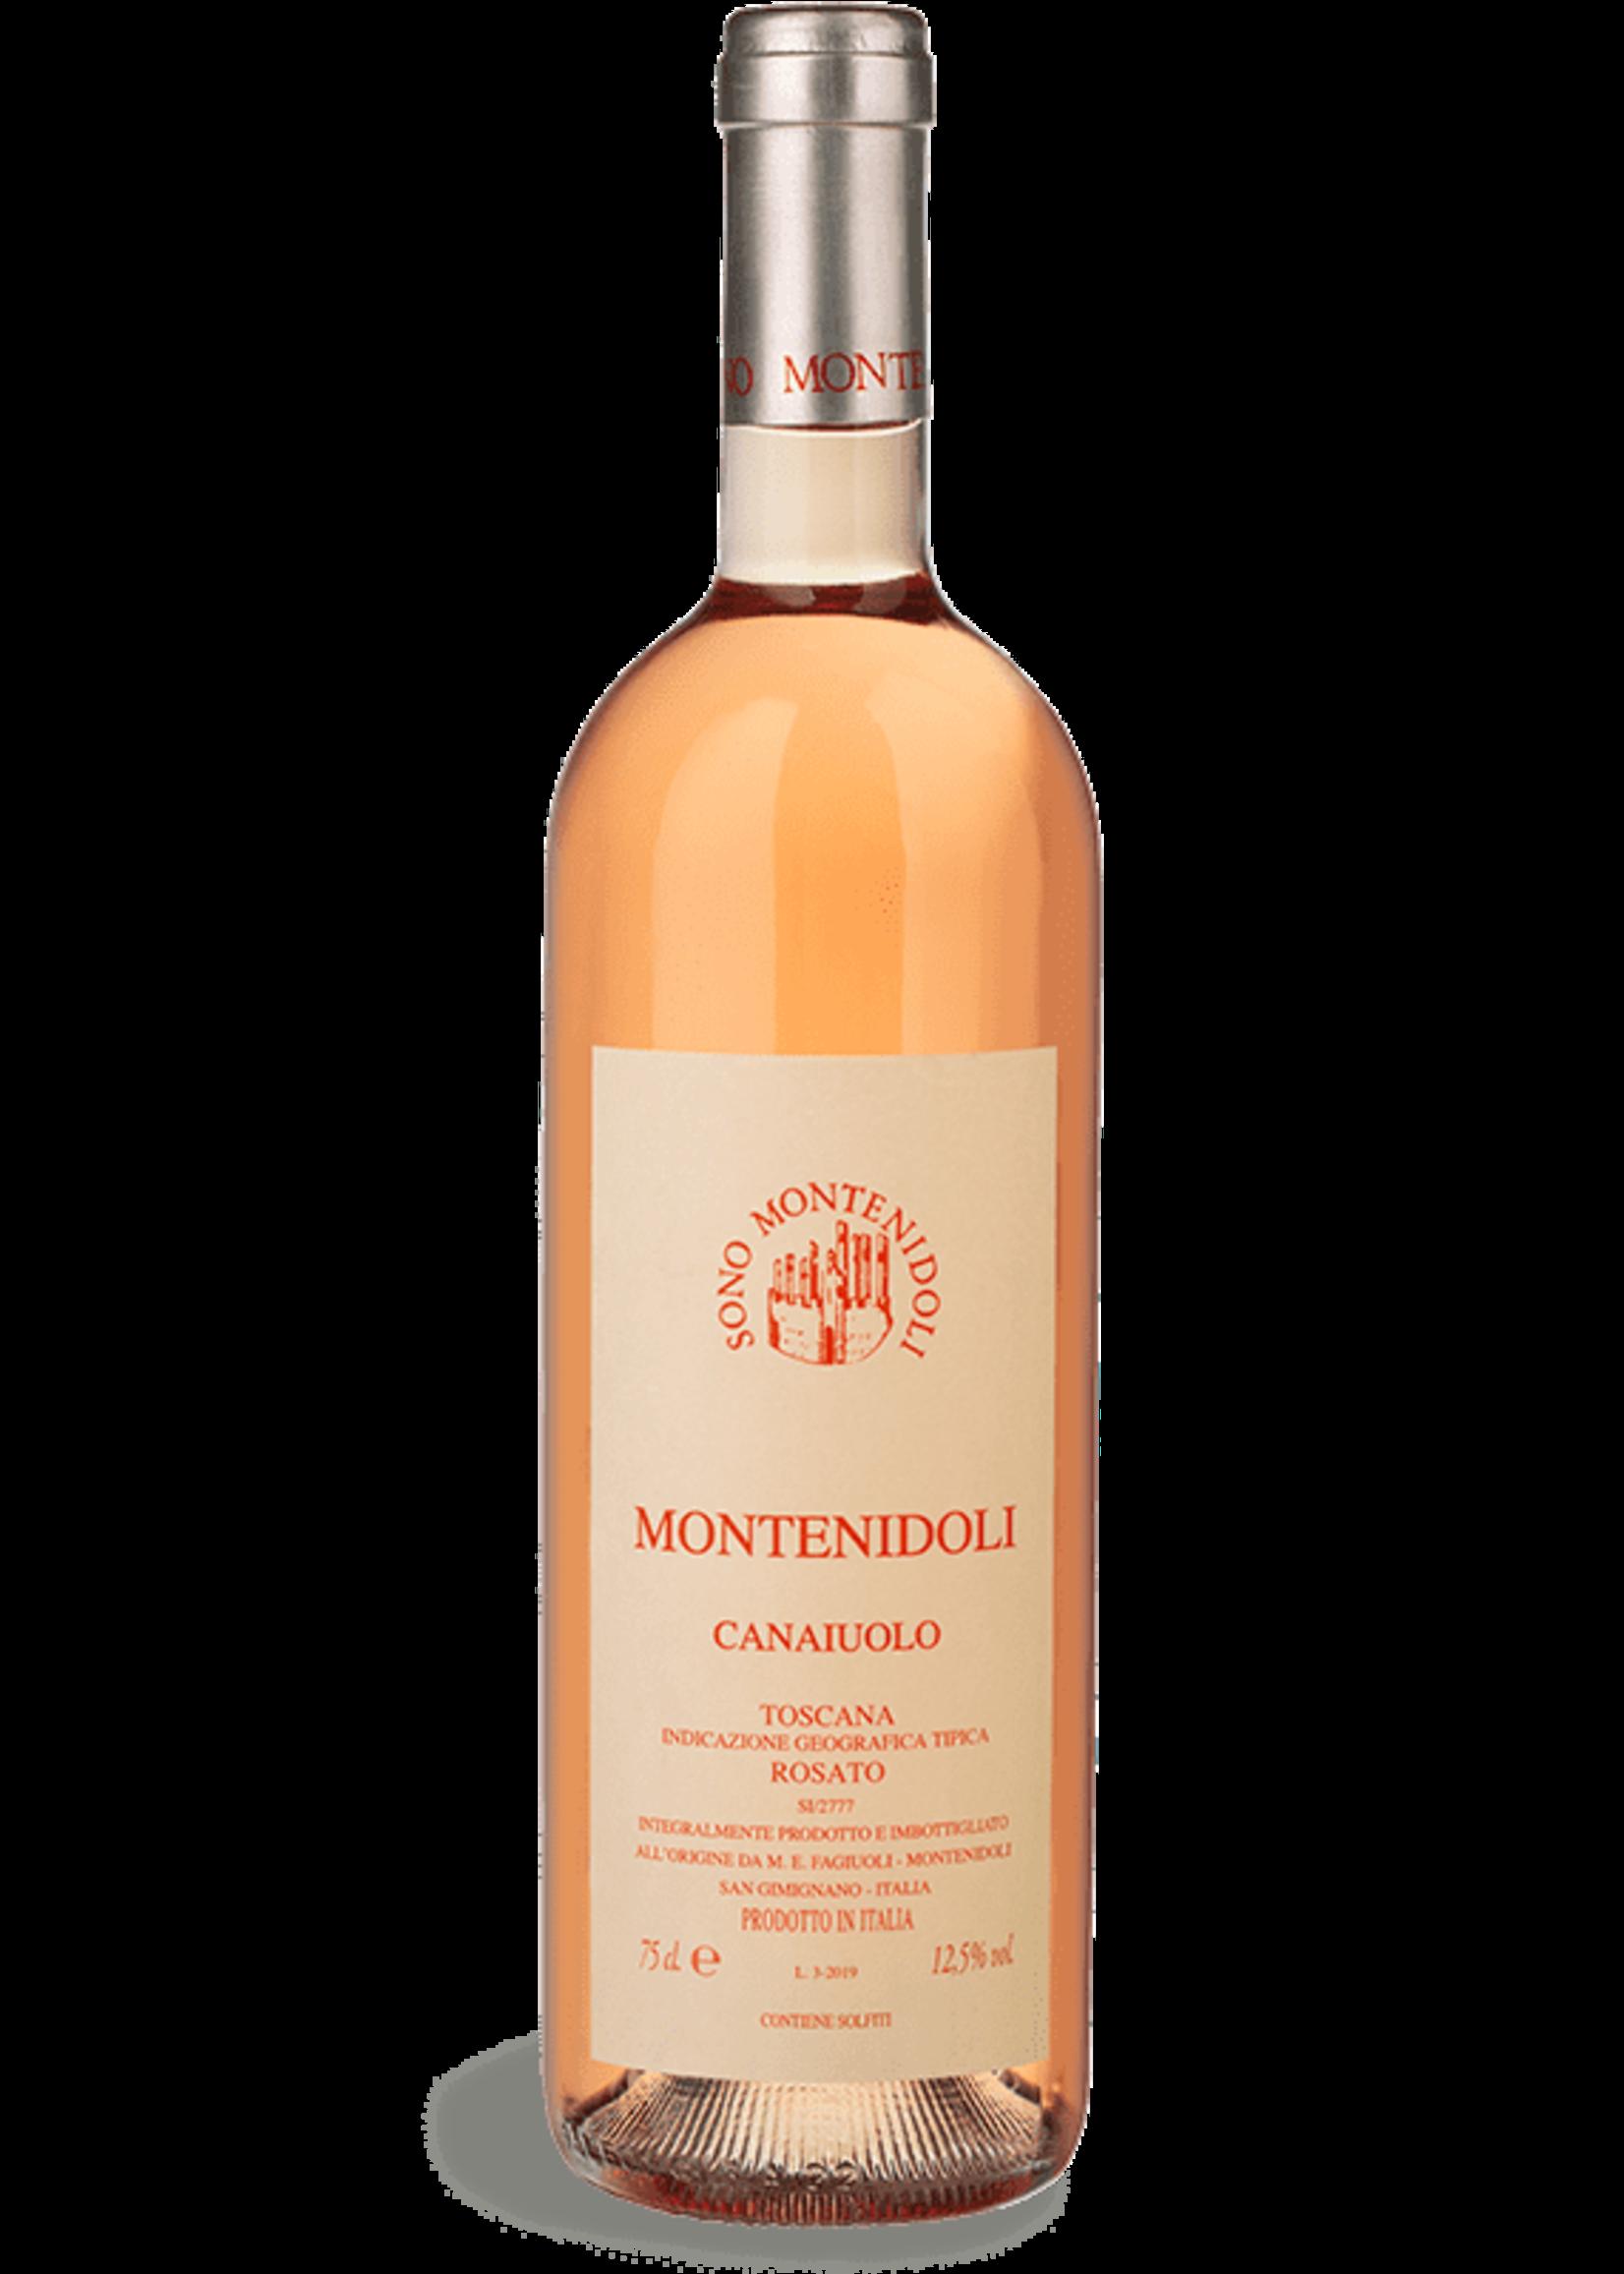 Montenidoli Rose of Canaiuolo, IT